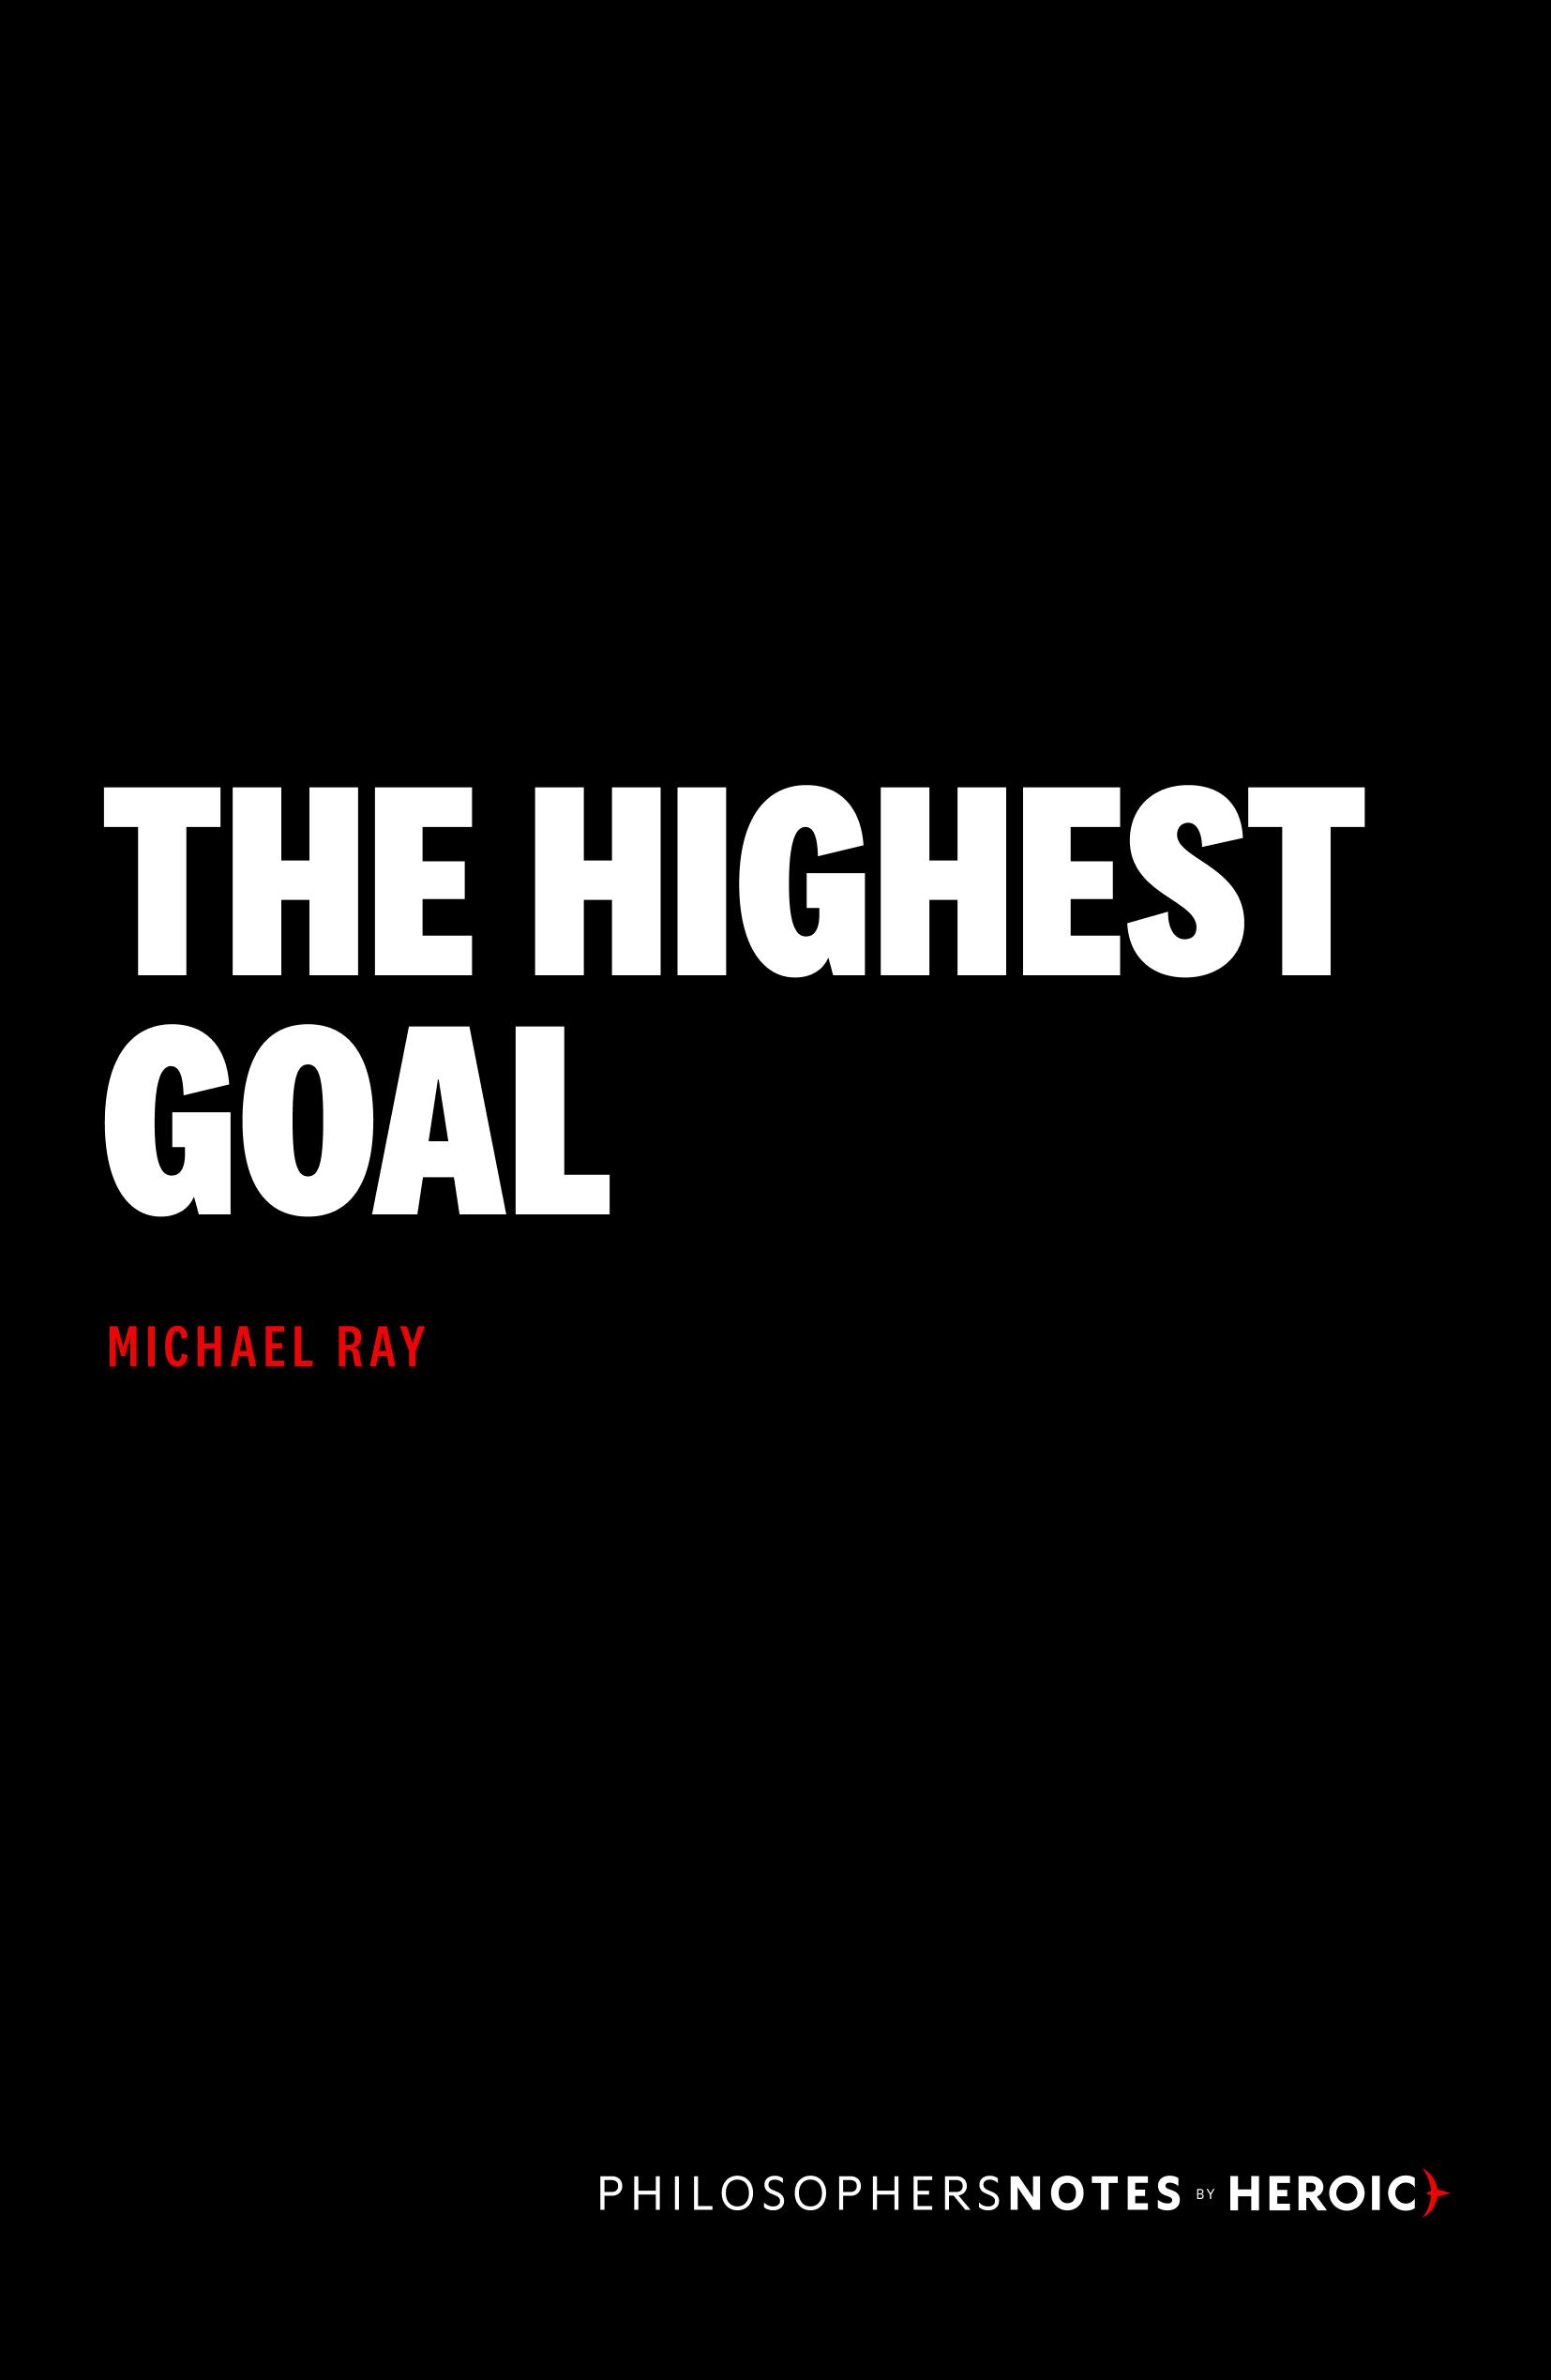 The Highest Goal